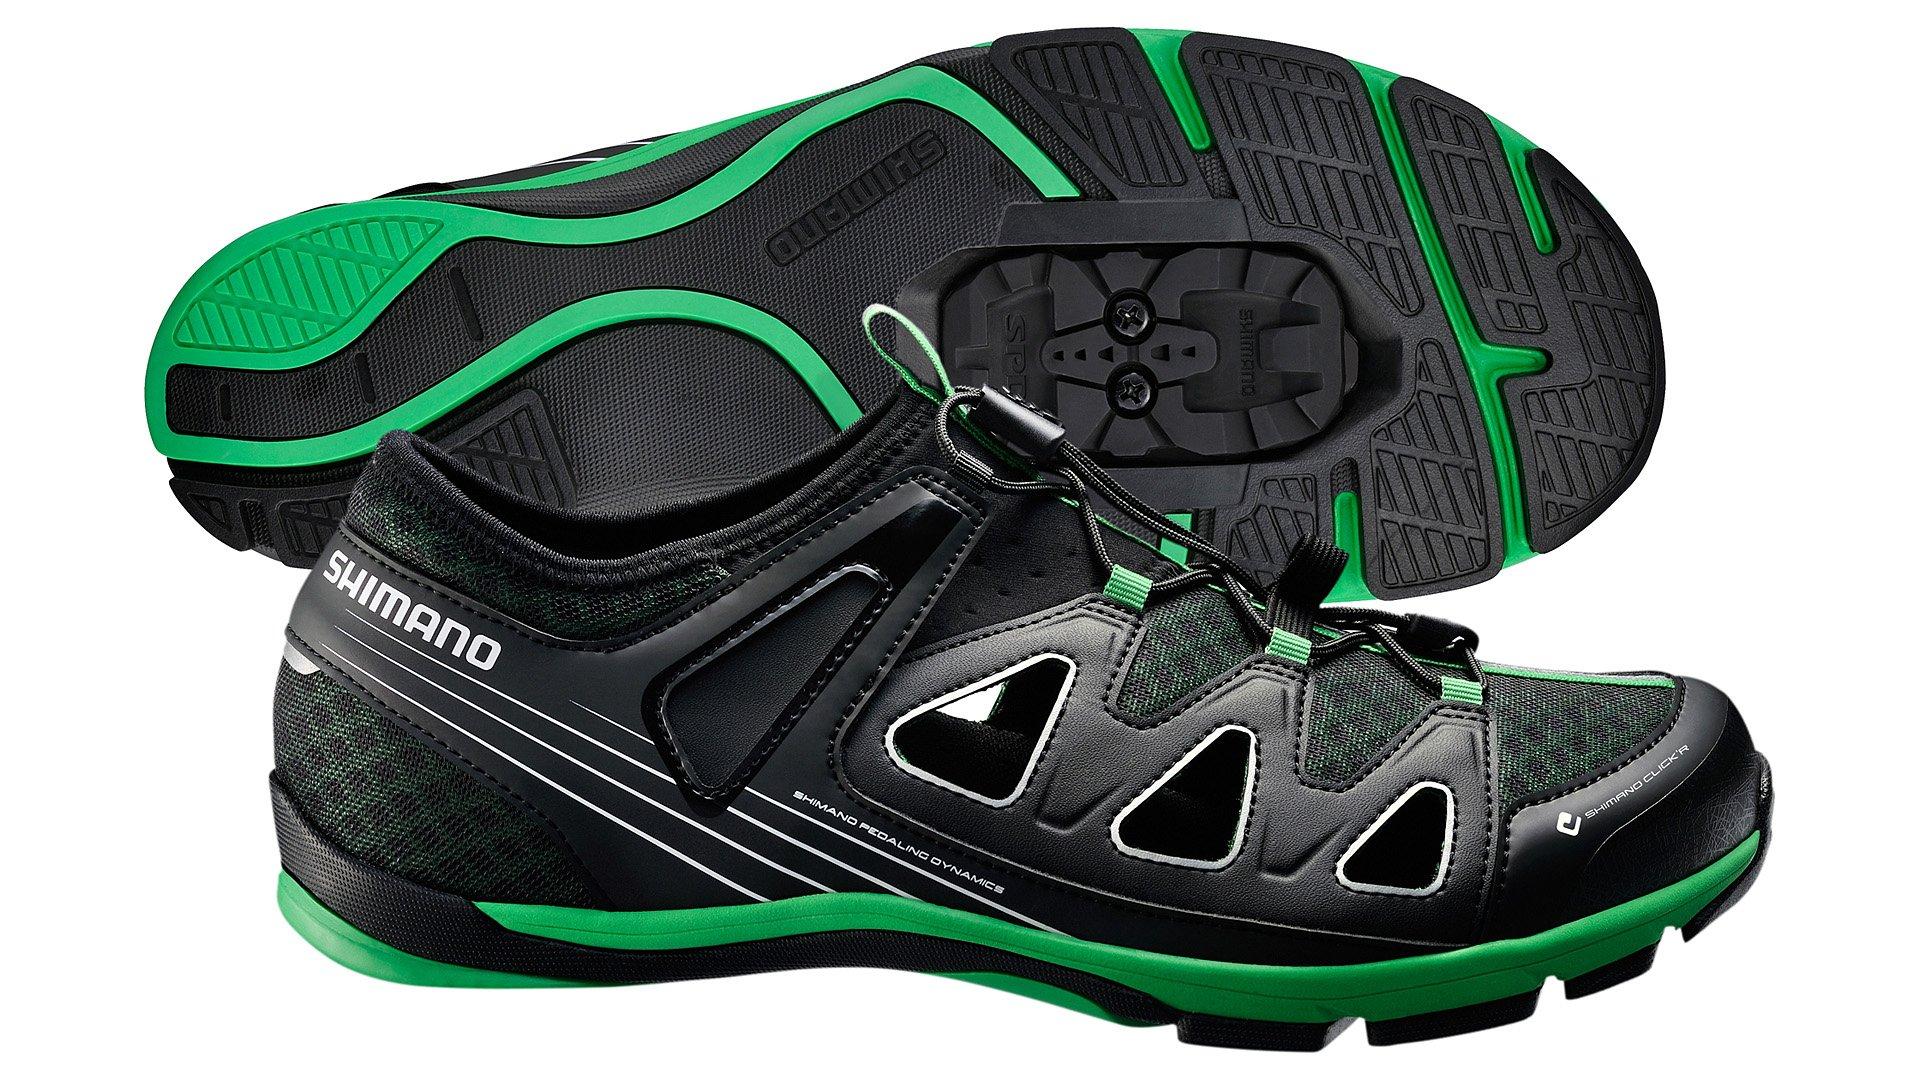 Turistická obuv SHIMANO SH-CT46LG - 43